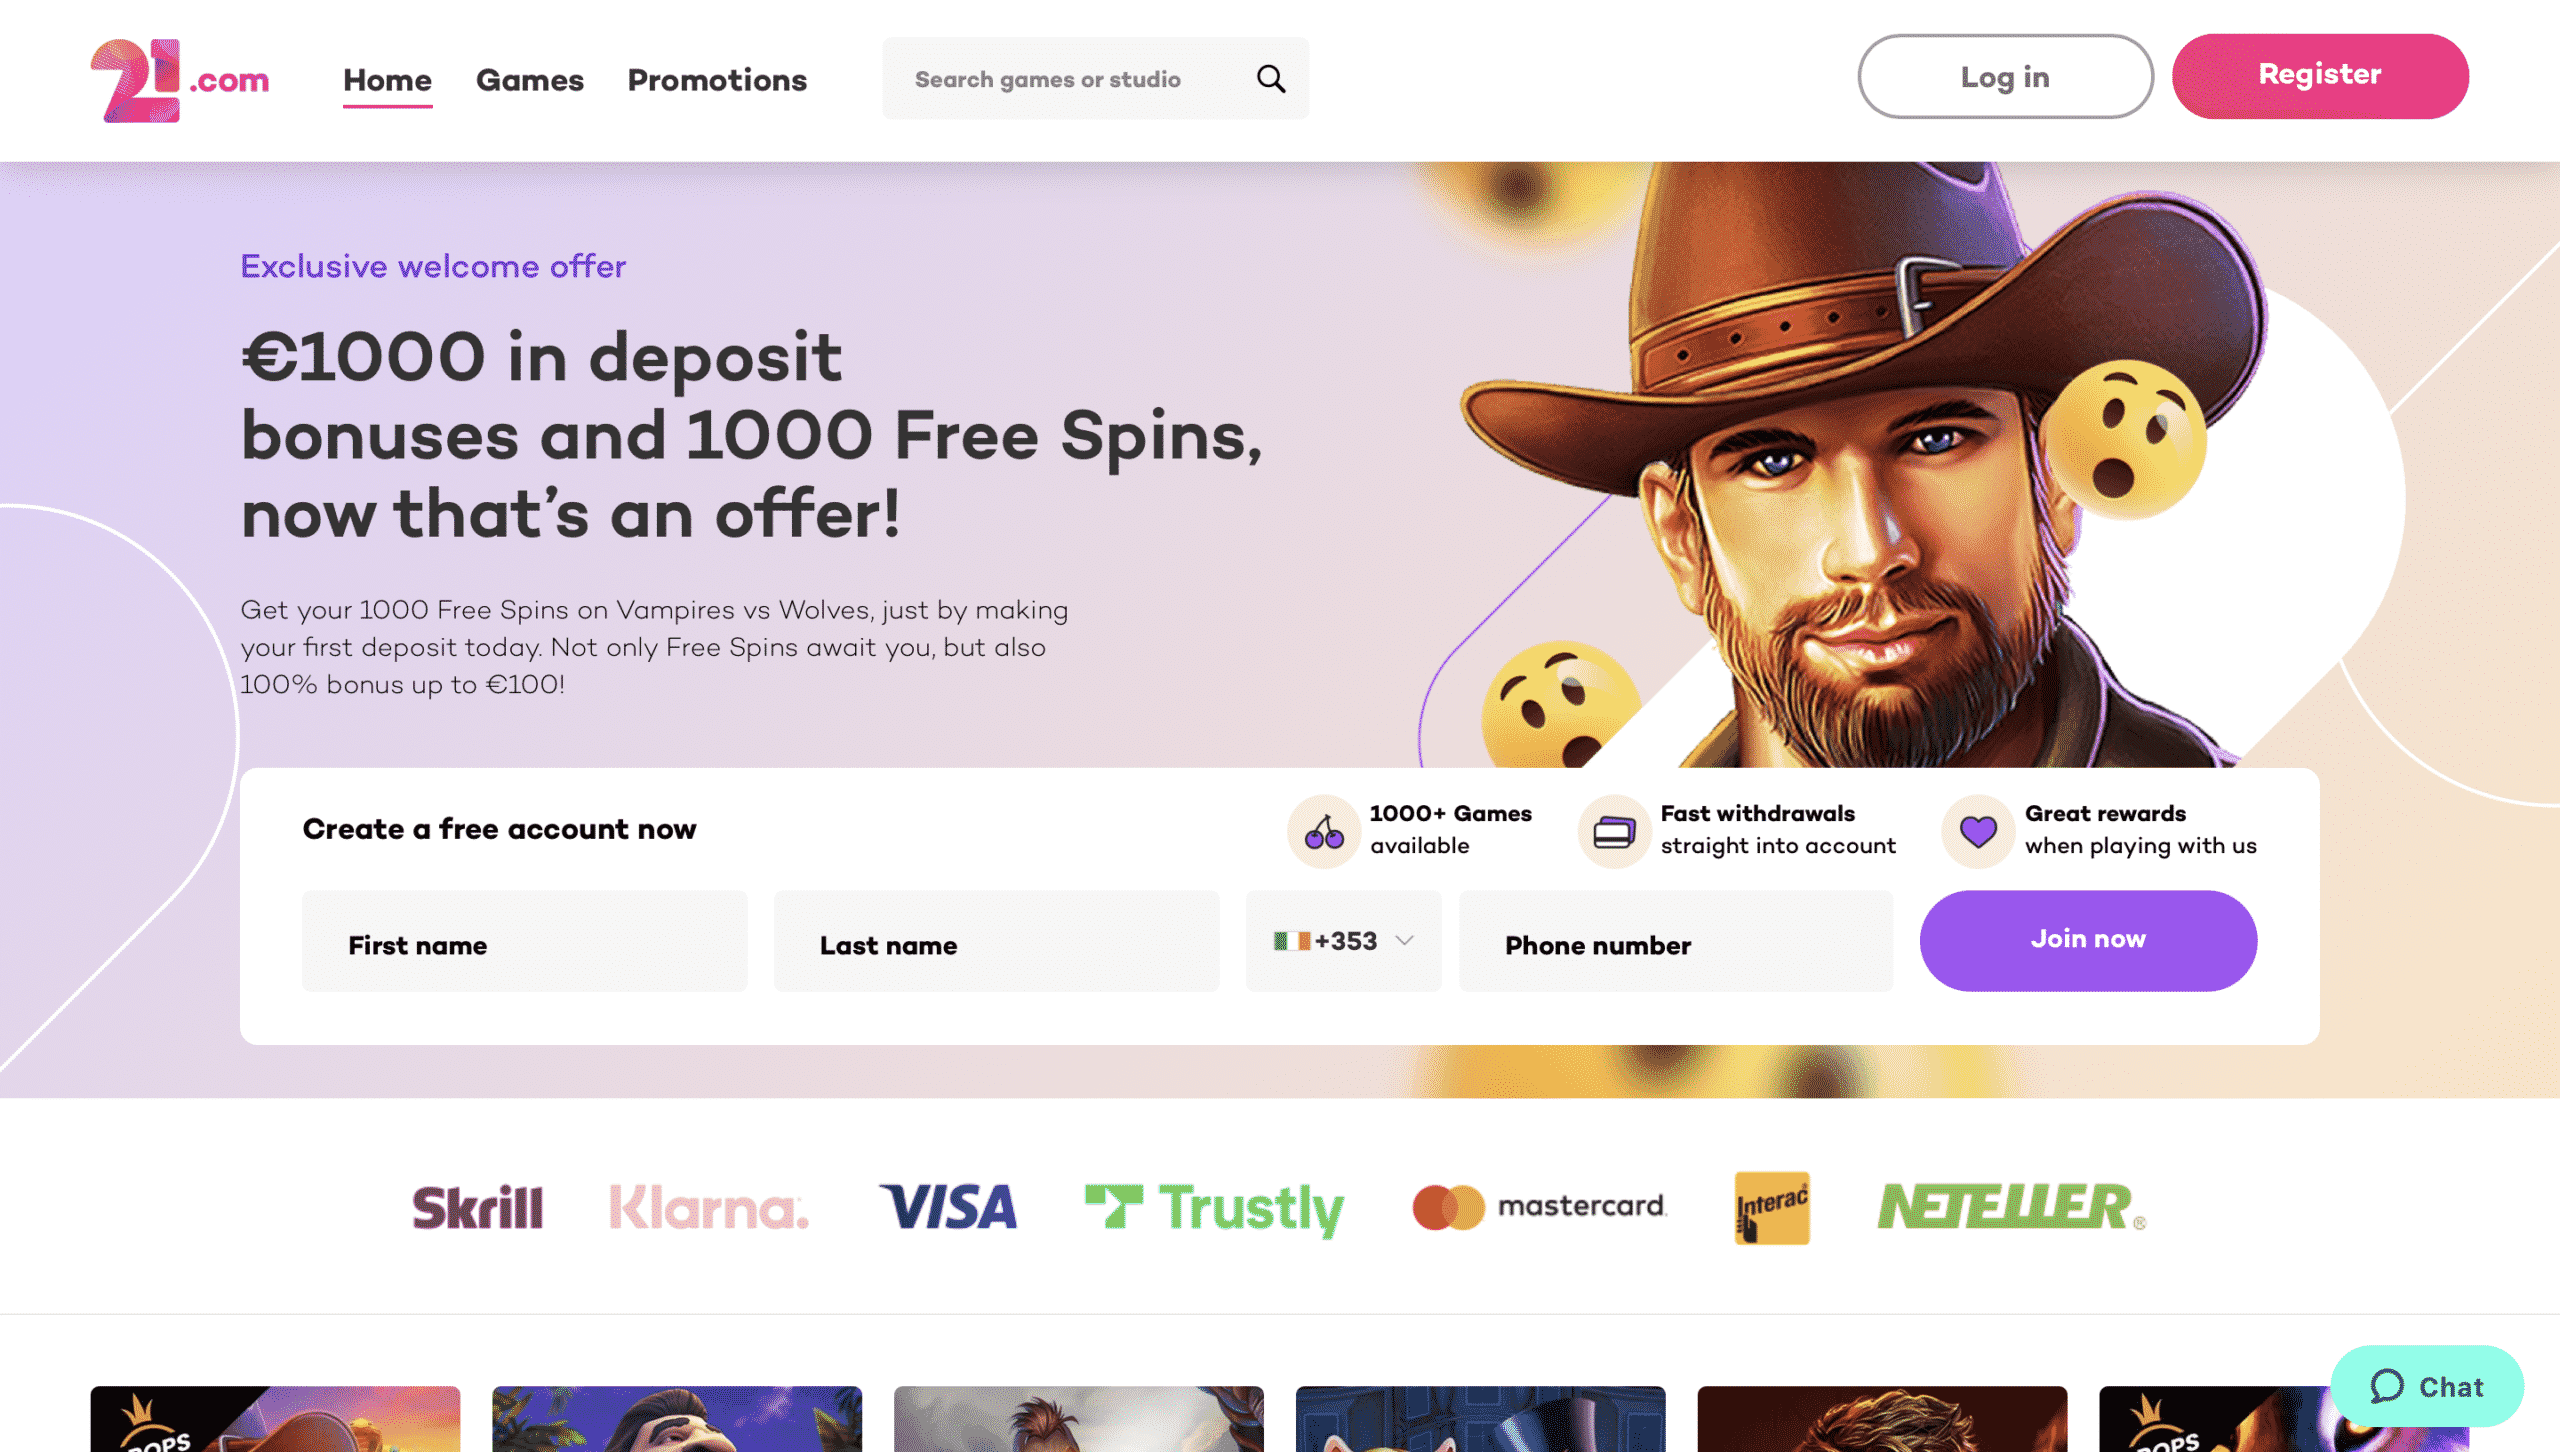 21.com Homepage